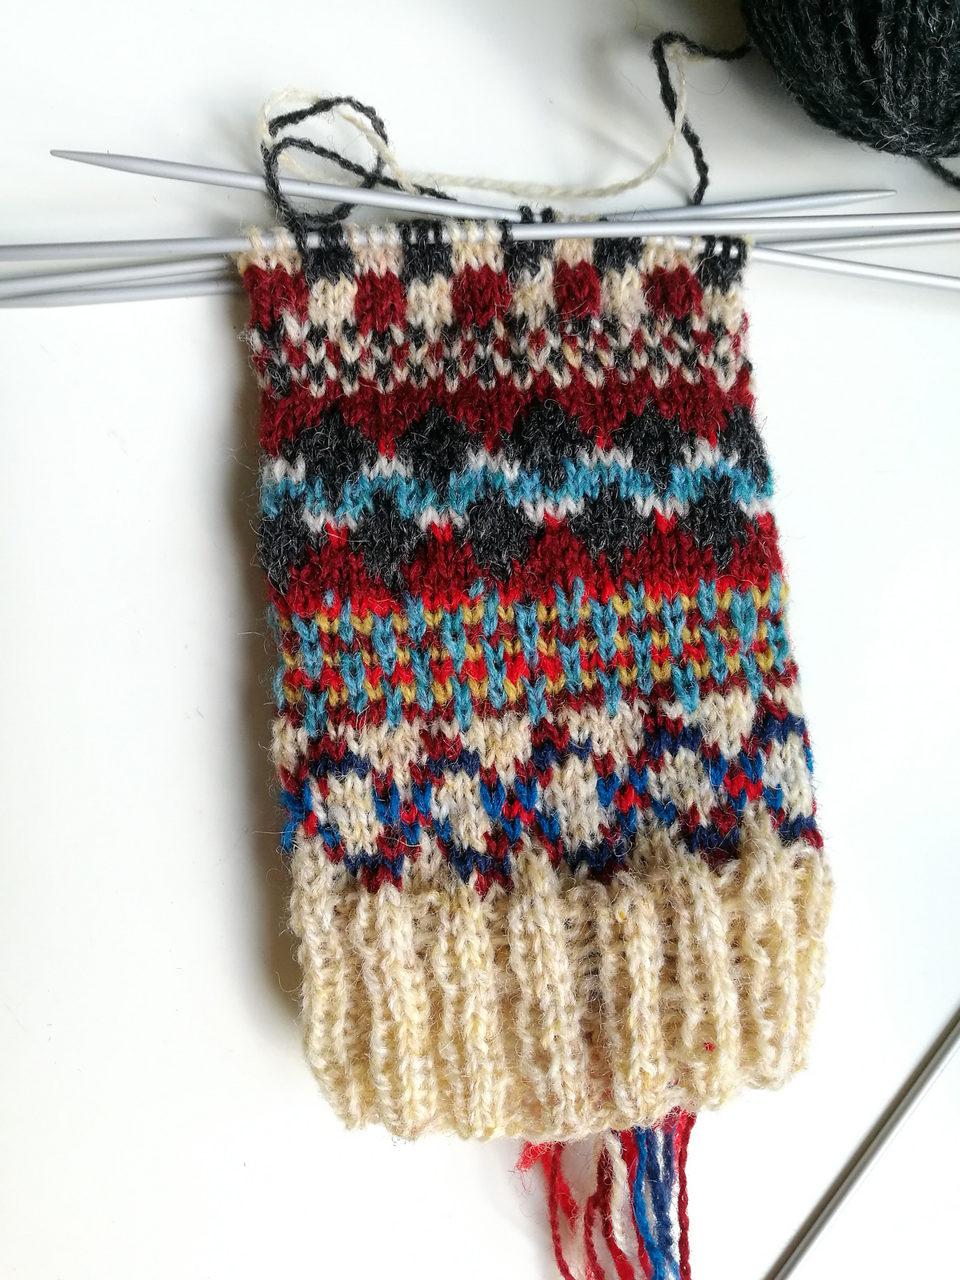 Tabusn knits knitting sheaths!